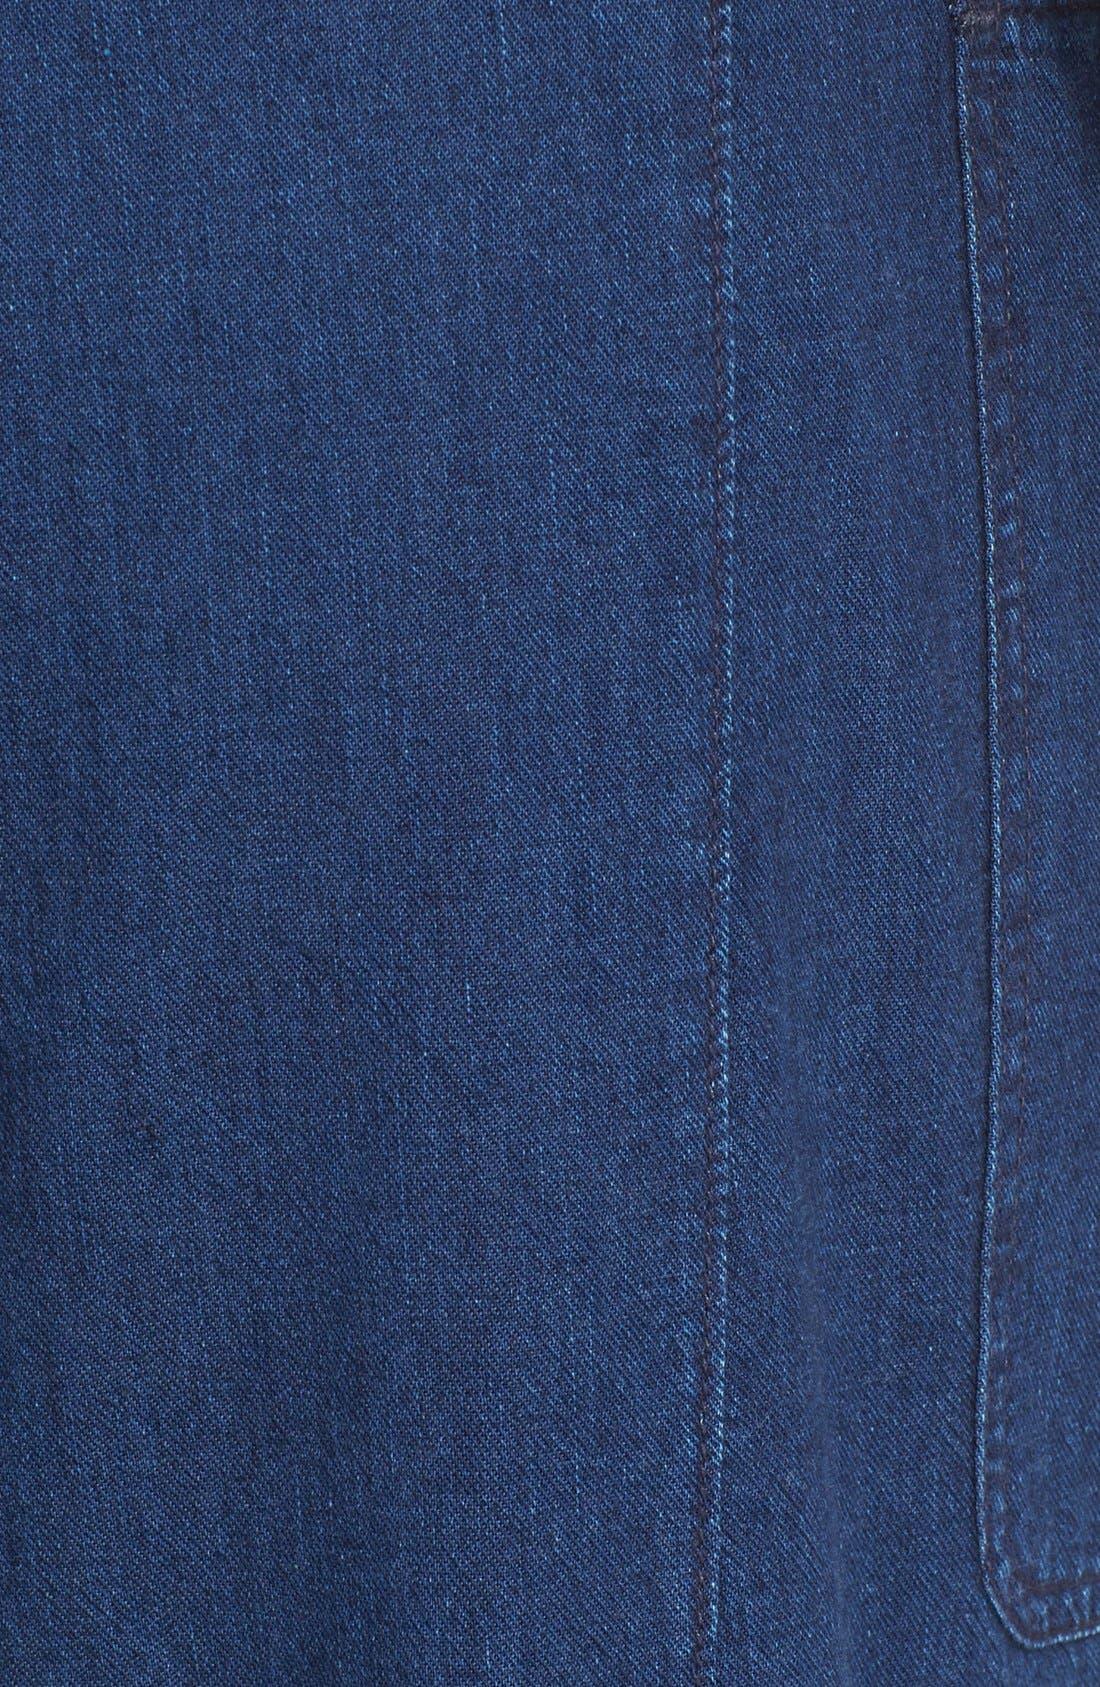 Rinsed Denim Patch Pocket Utility Pants,                             Alternate thumbnail 6, color,                             400